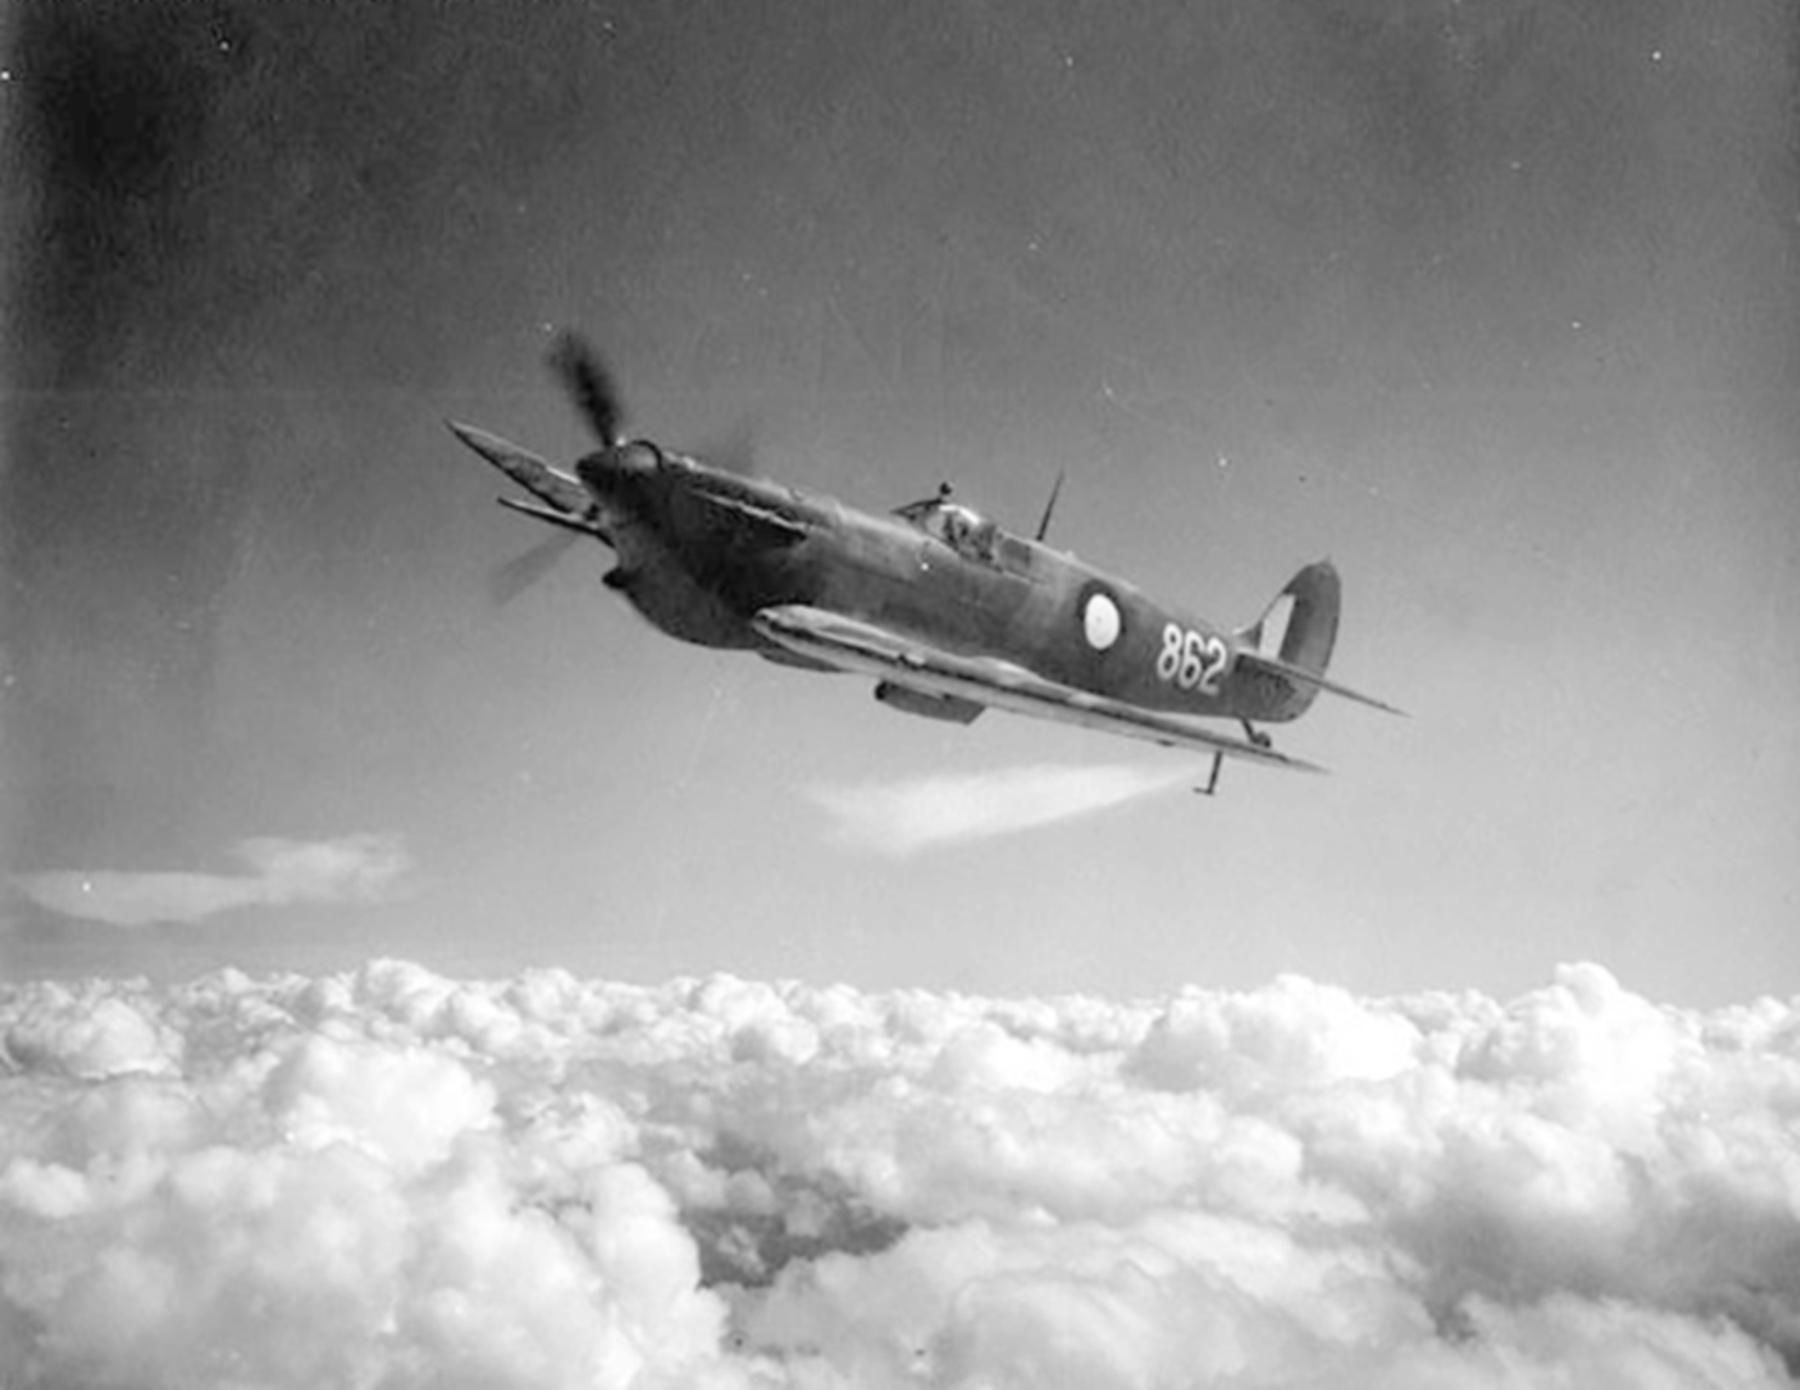 Spitfire MkVcTrop RAAF 2OTU 862 John Waddy LZ862 A58 217 Victoria 1943 01